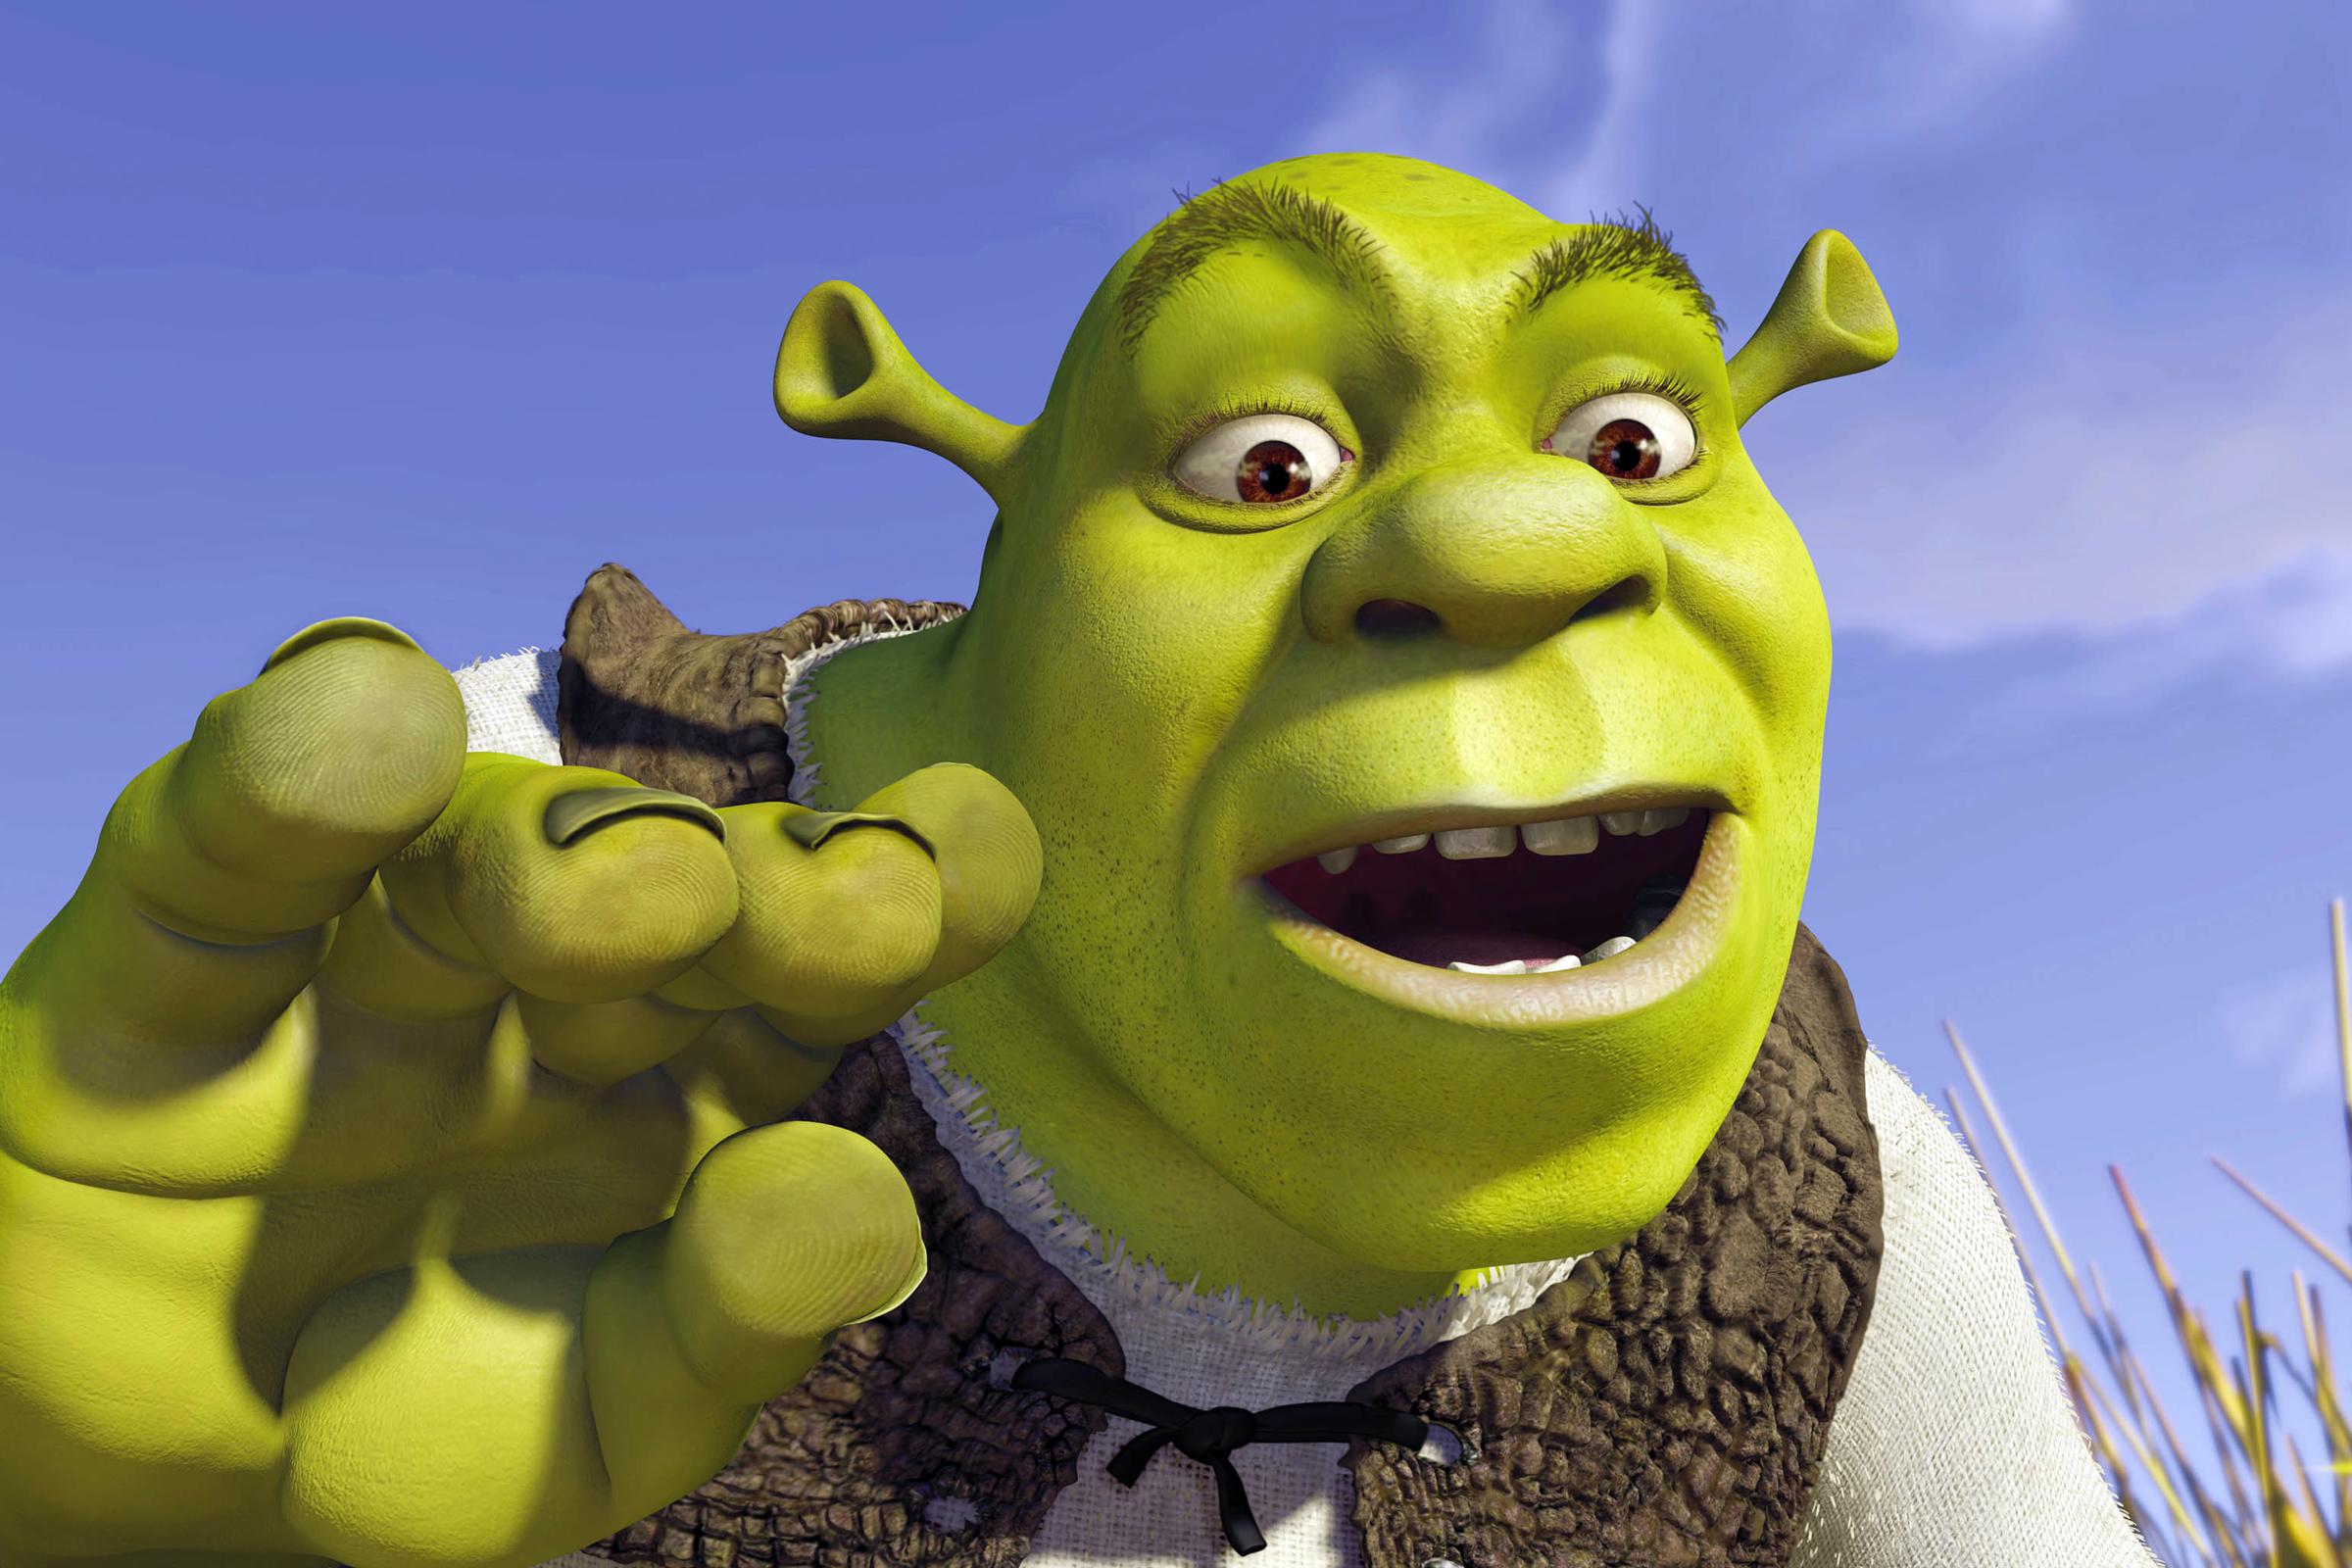 'Shrek' Soundtrack Making Vinyl Debut for Special Edition Reissue